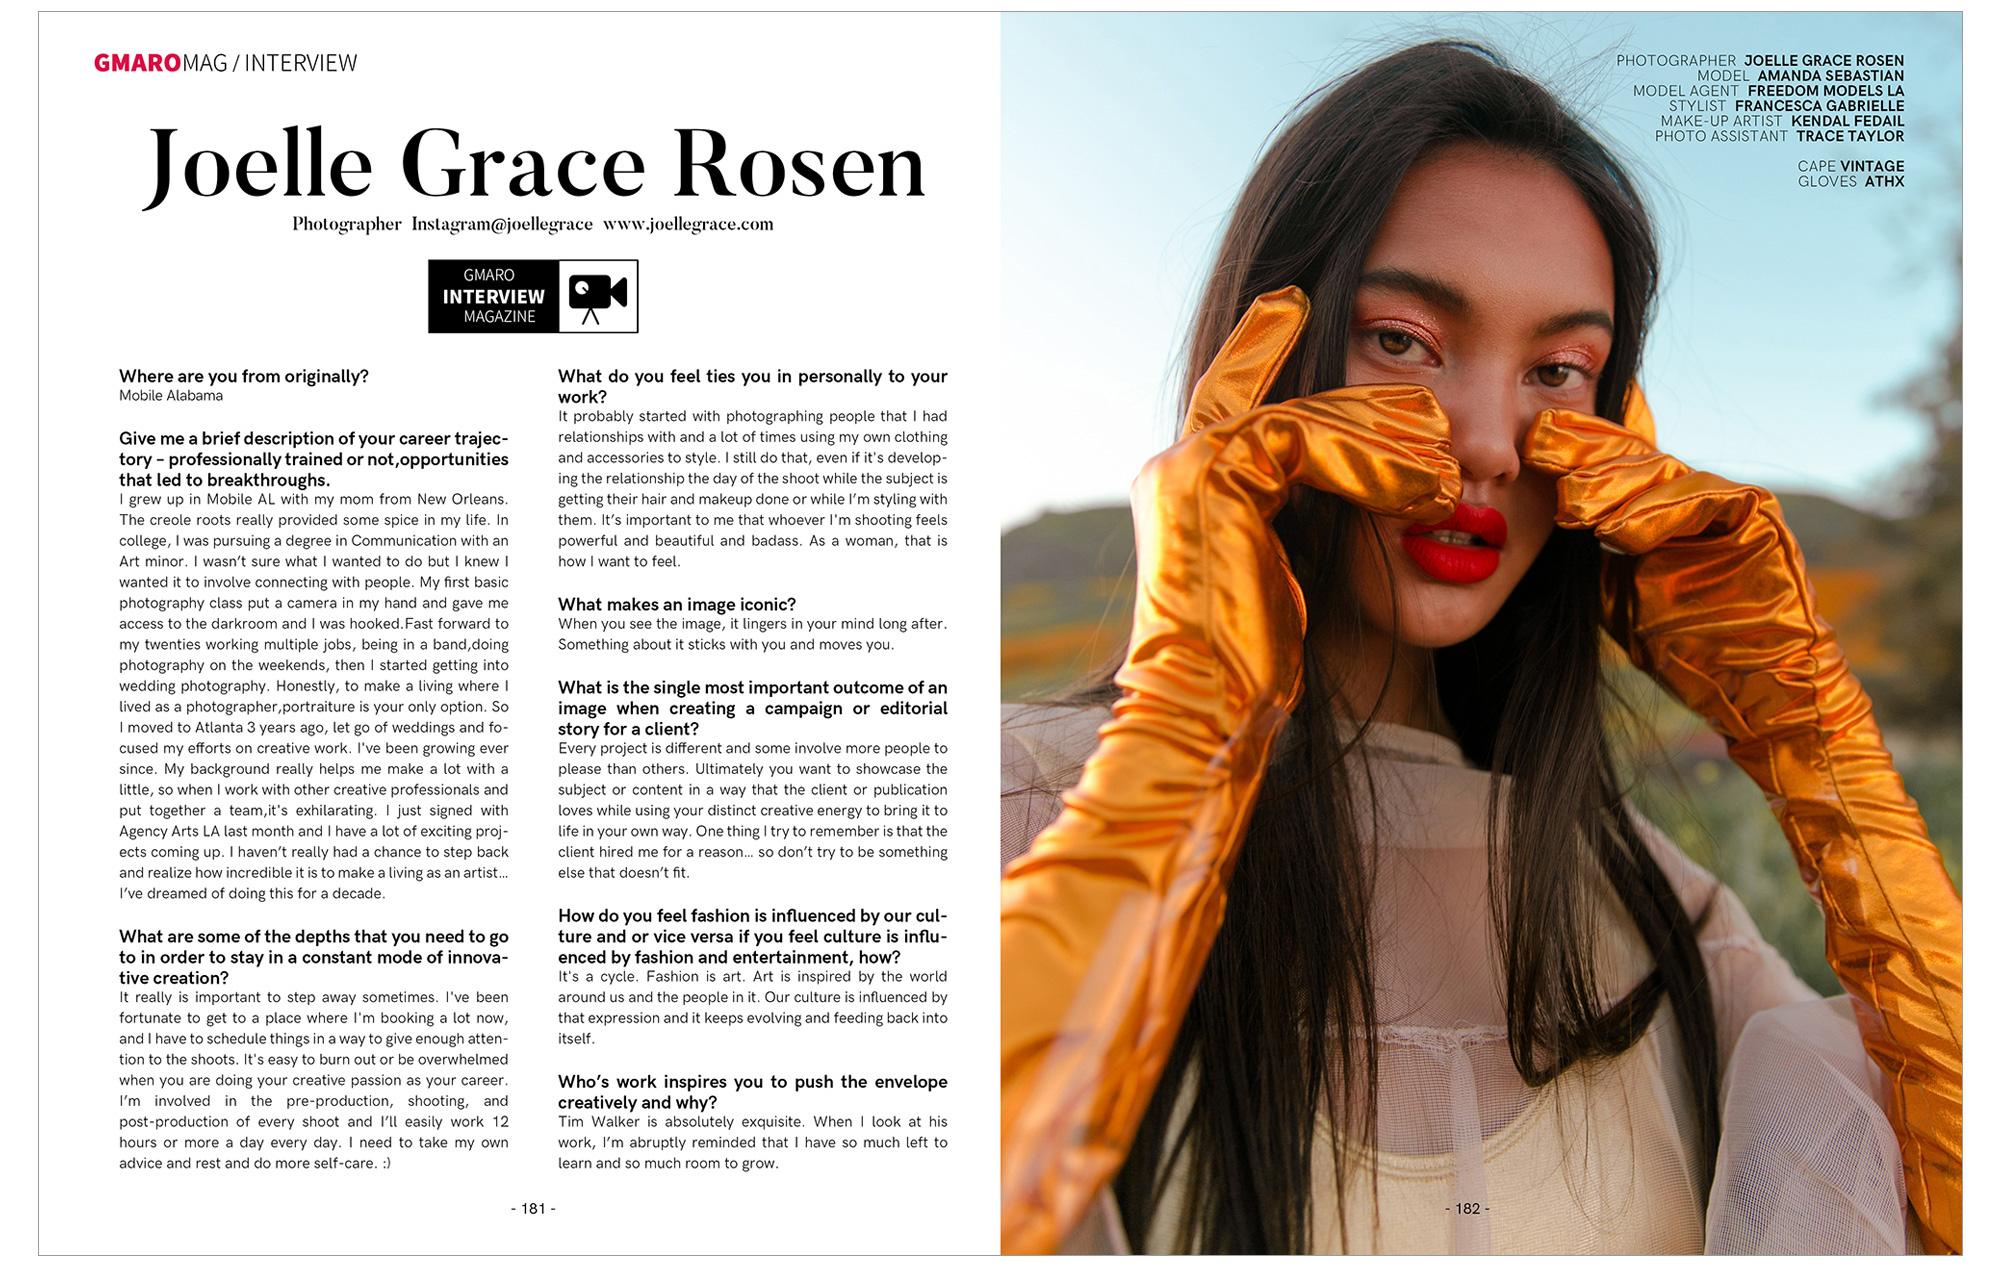 Page181-182-Double-page-GMARO-Magazine.jpg